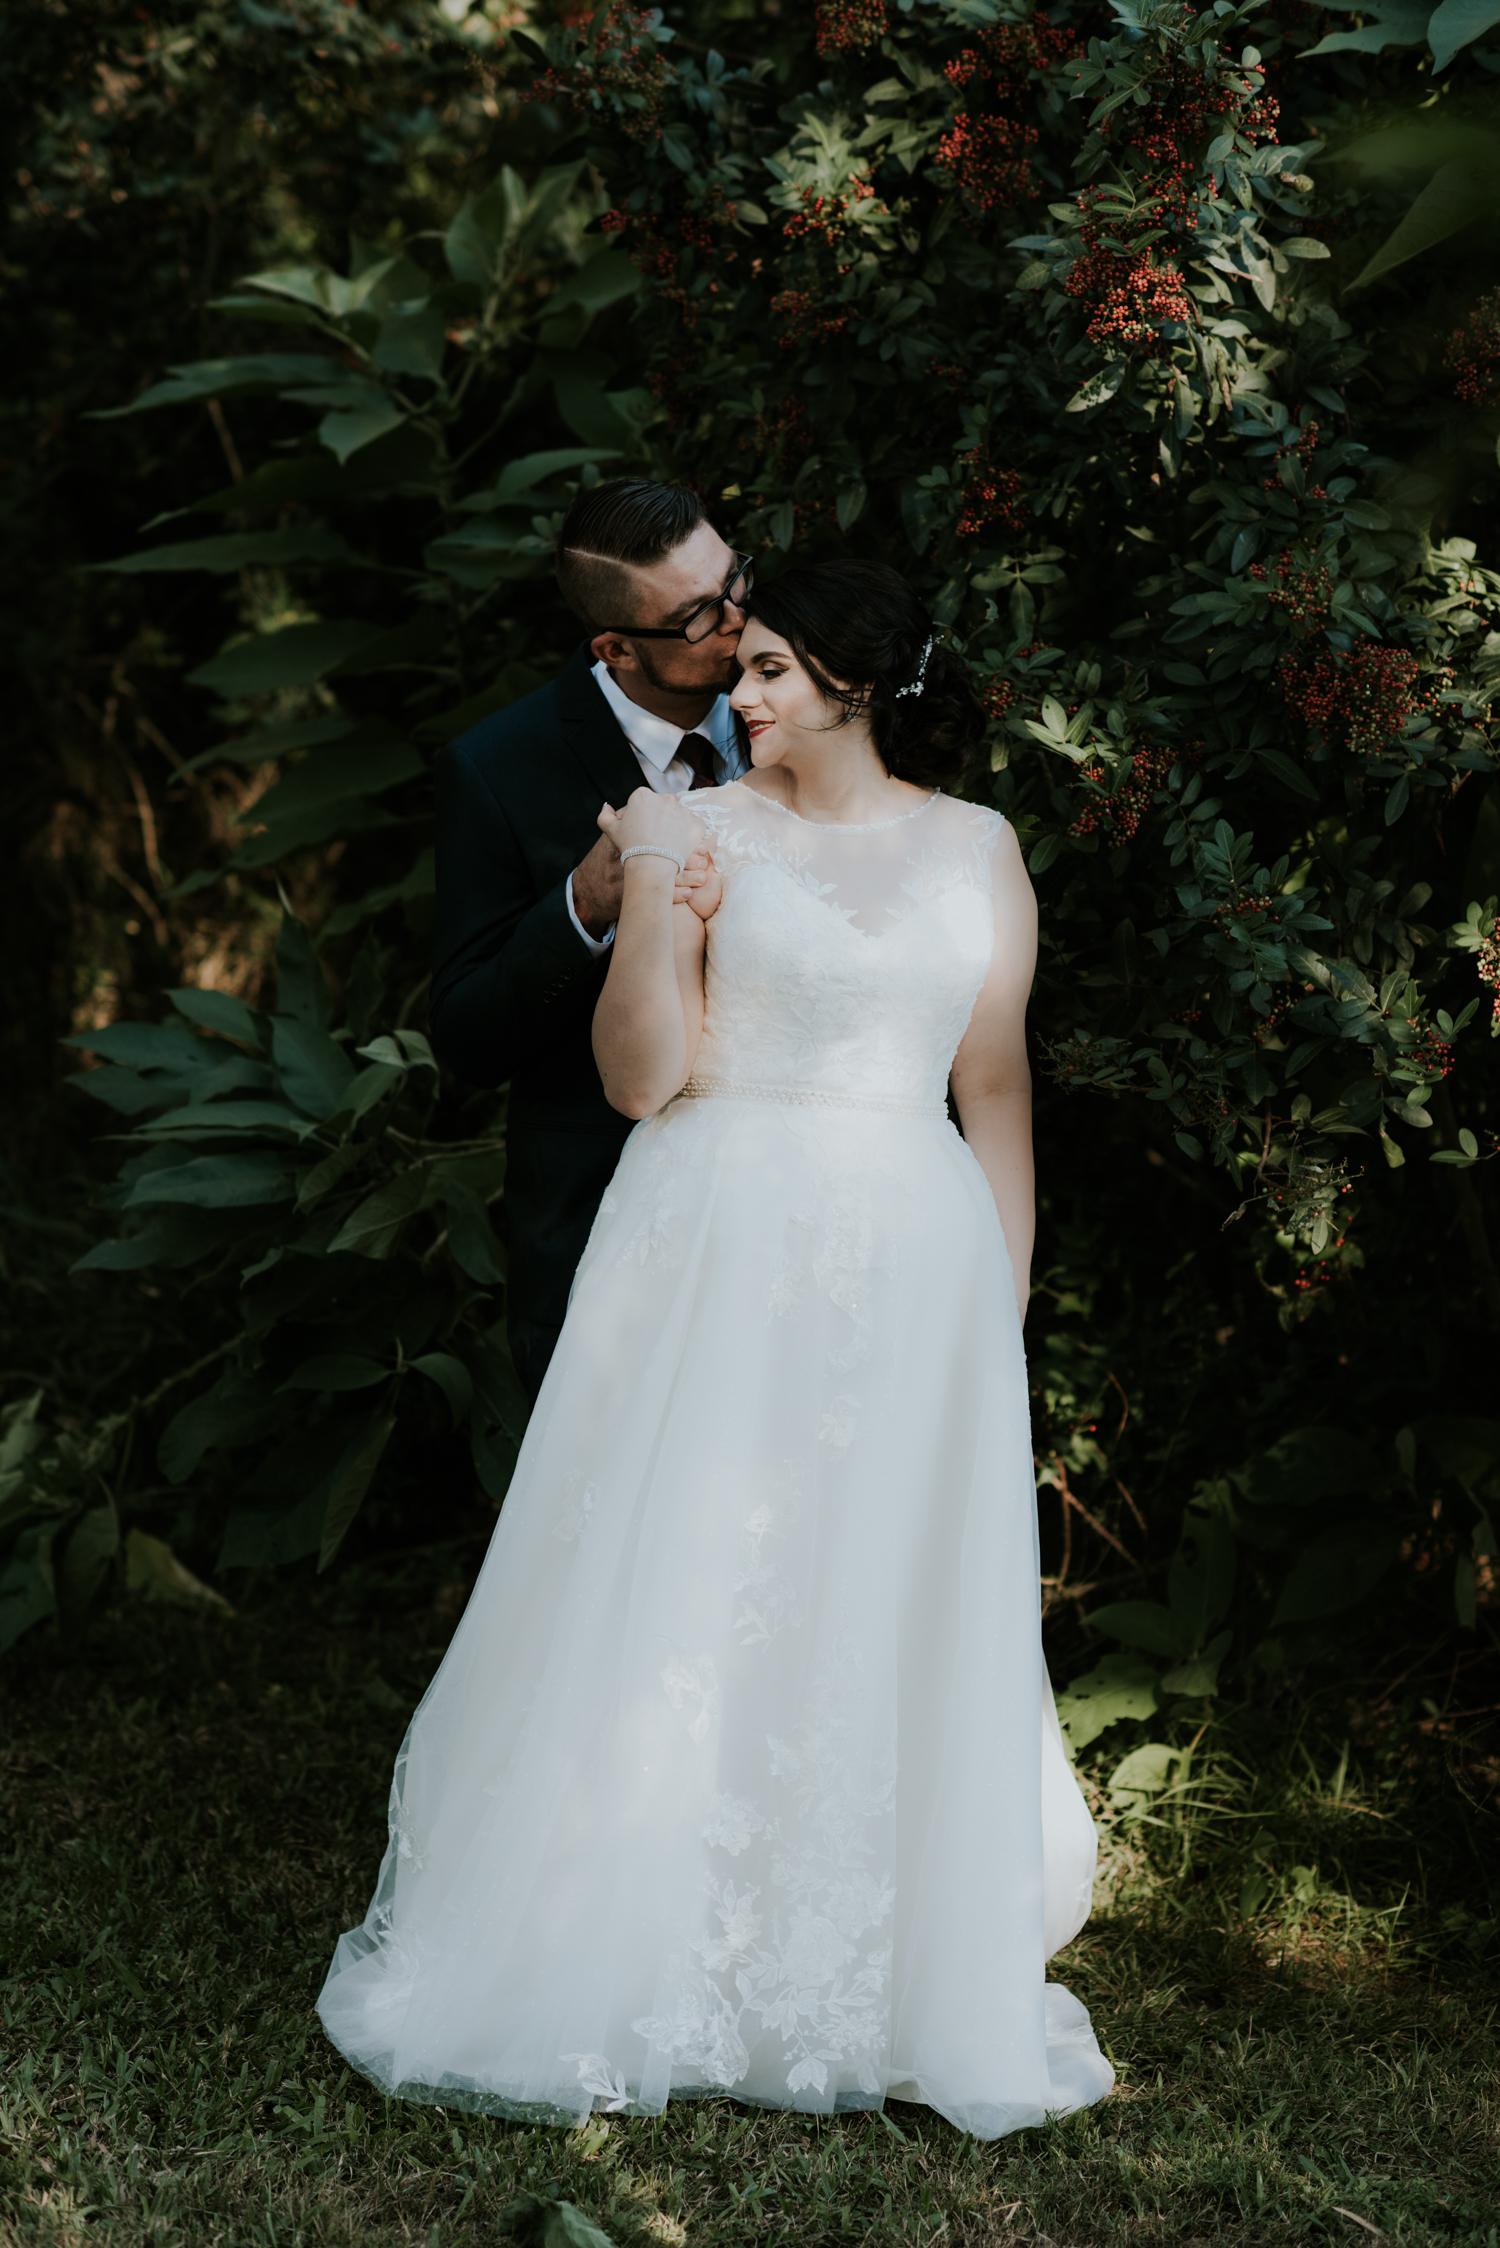 Brisbane Wedding Photographer | Engagement-Elopement Photography - additional-3.jpg